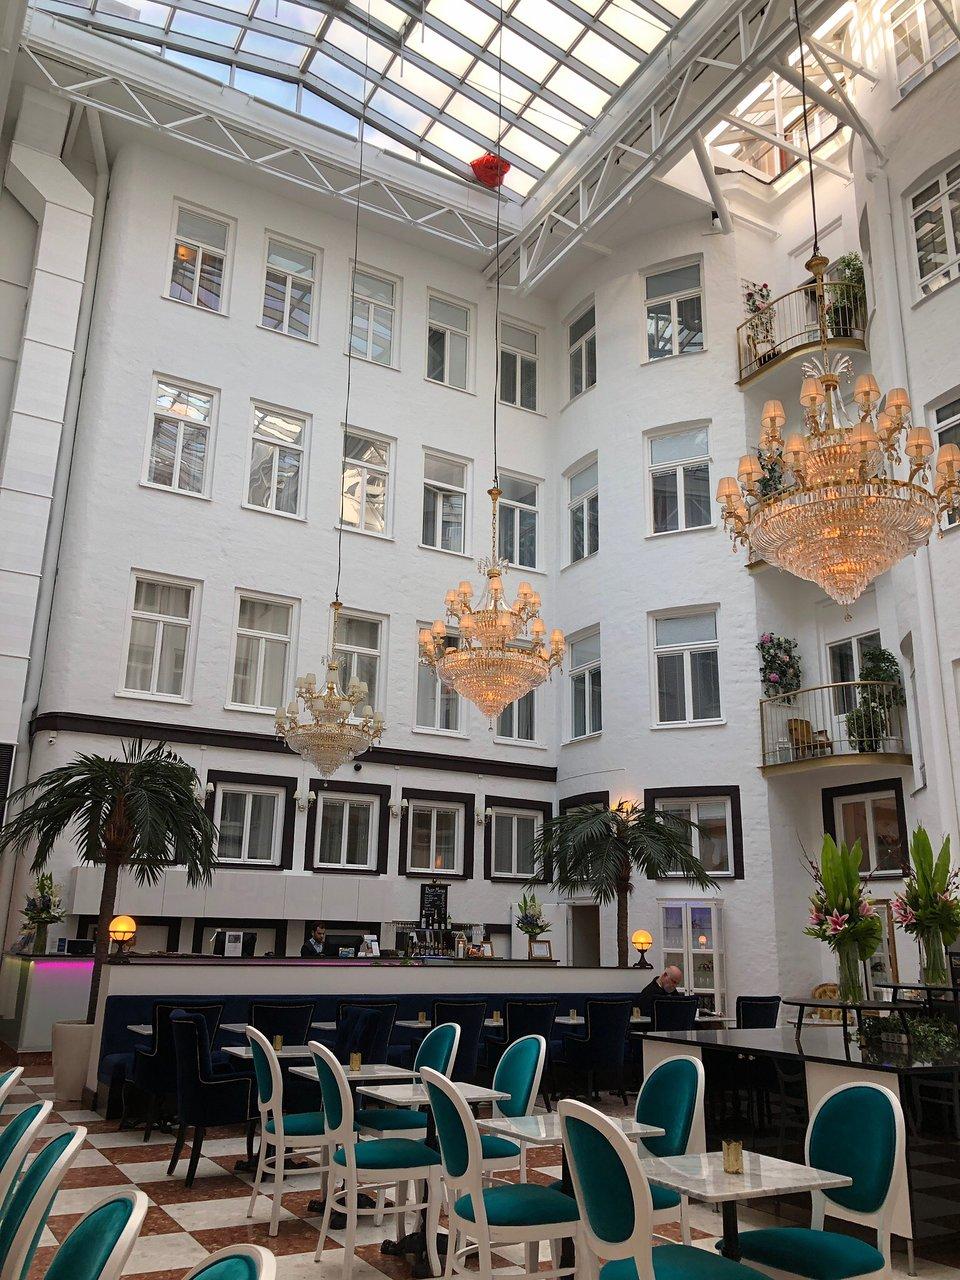 Best Western Hotel Bentleys i Stockholm ritat av Rex Arkitektbyrå